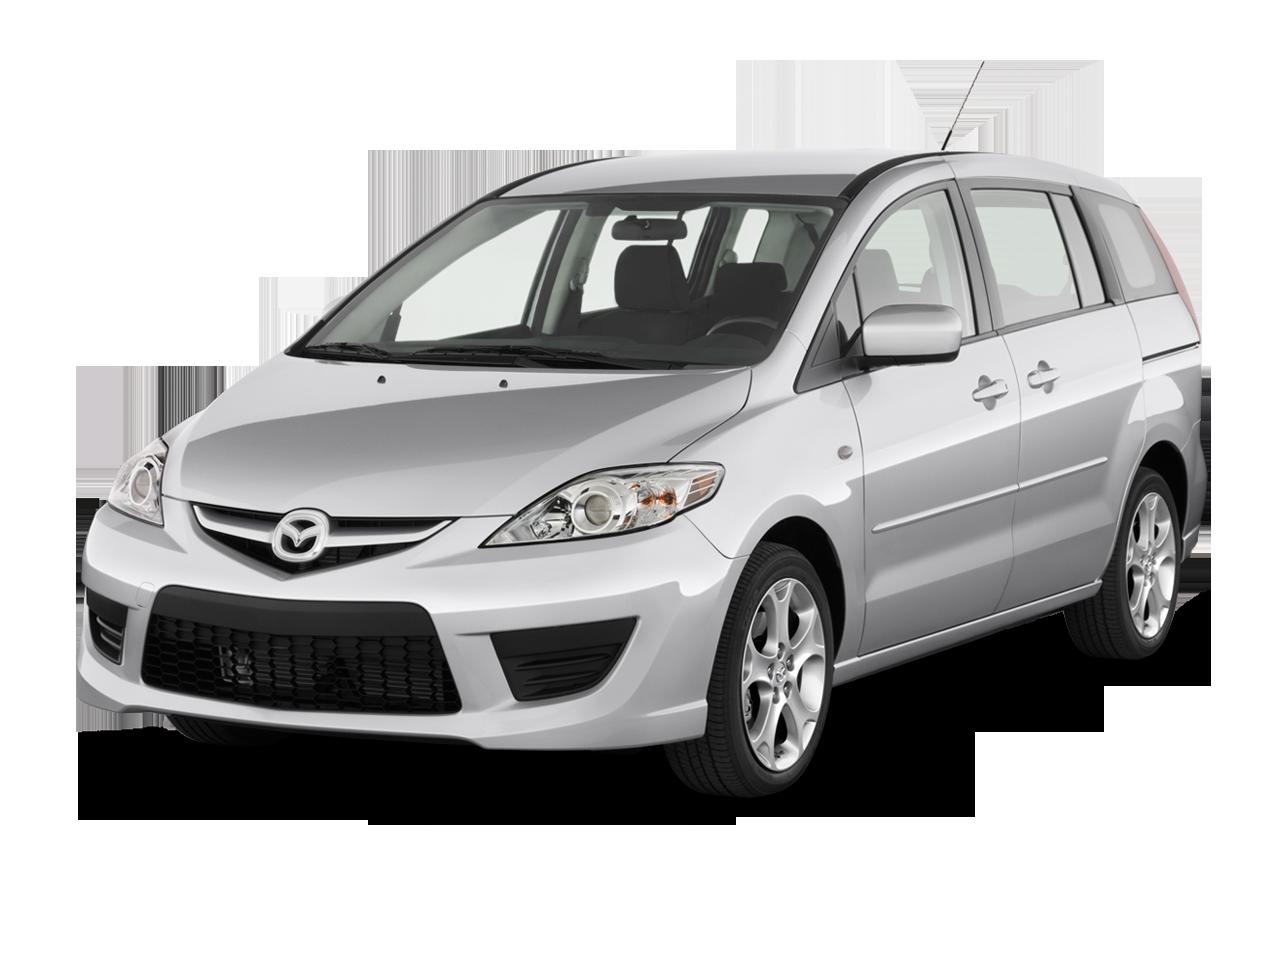 Minivan clipart transparent background. Mazda png